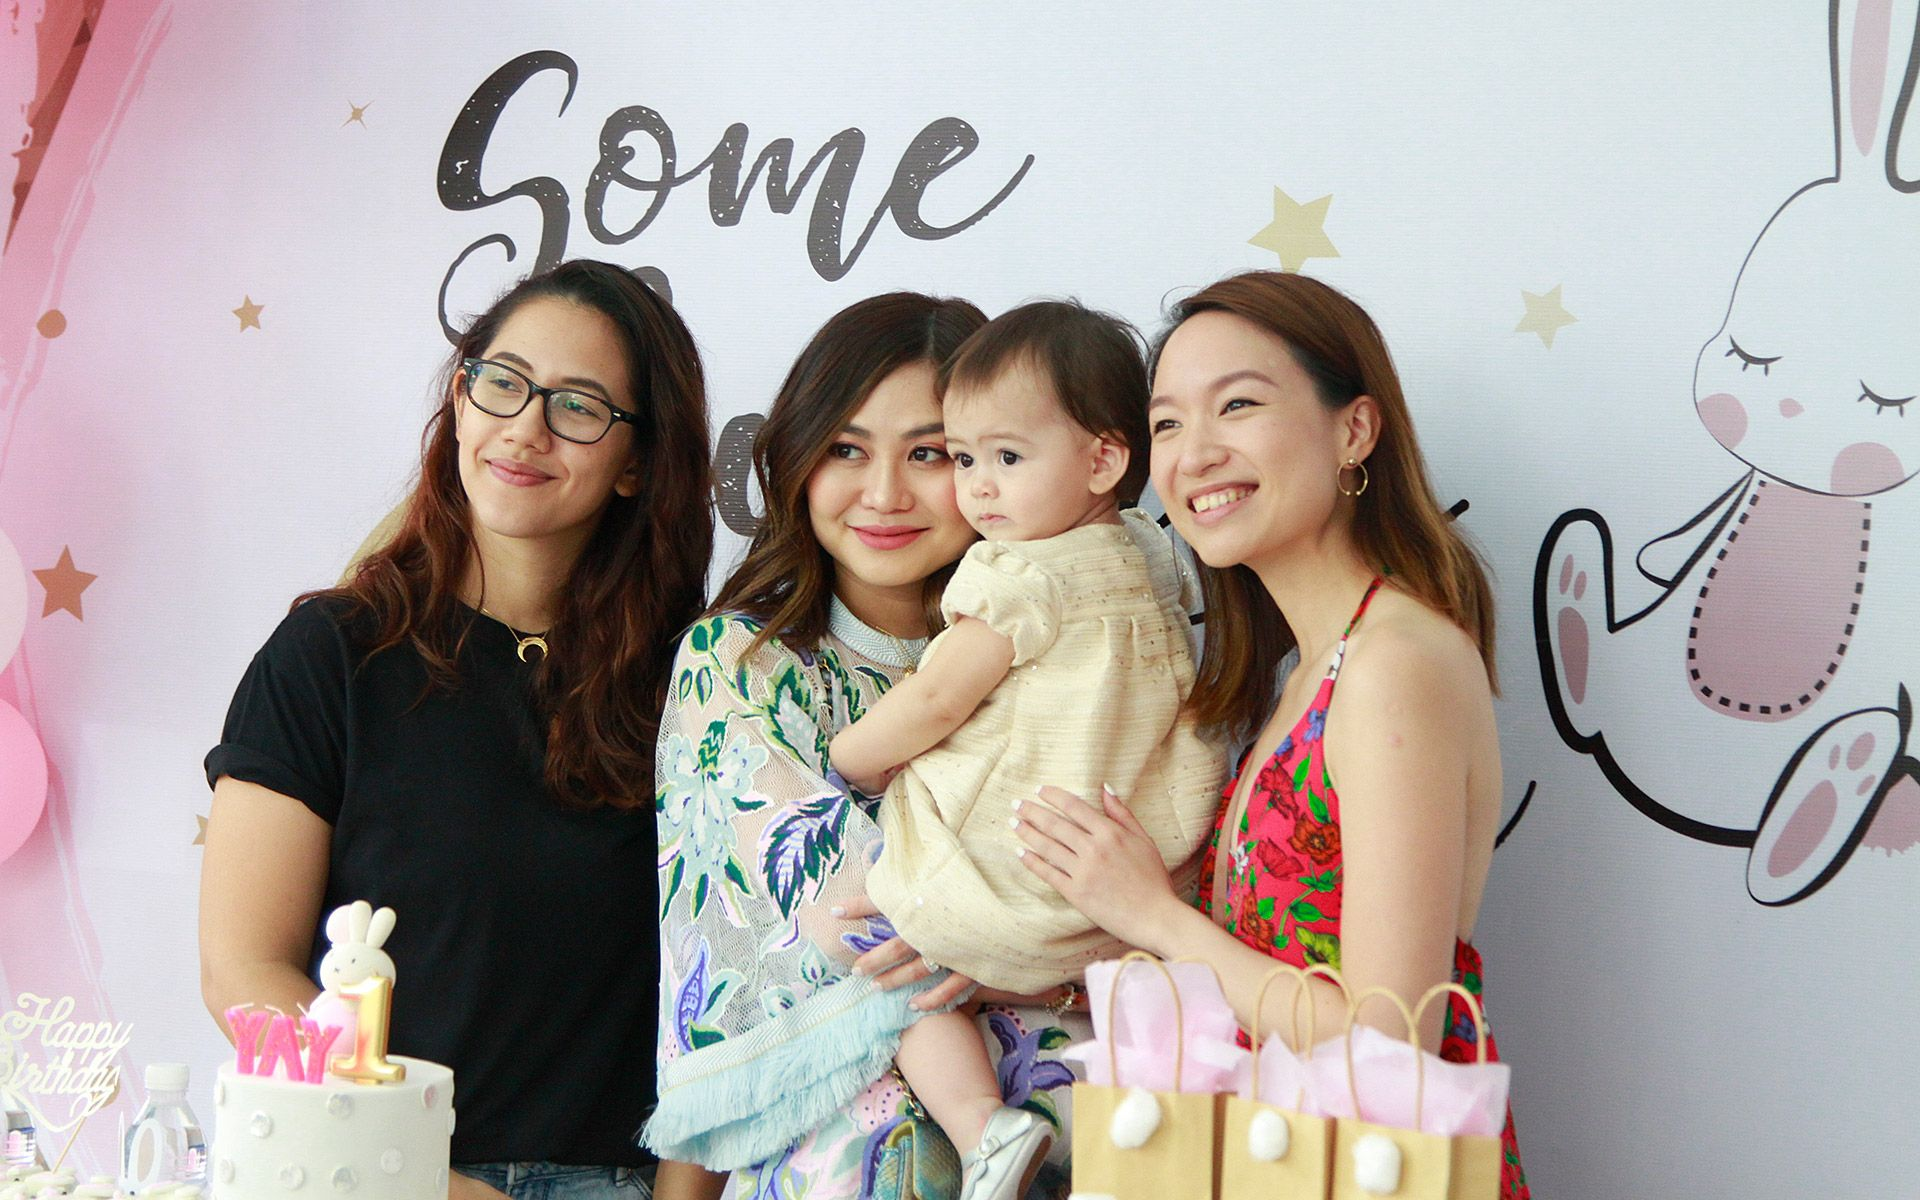 Simone Camy, Jenn Low, Olivia Hua Elliott and Sheryl Oon